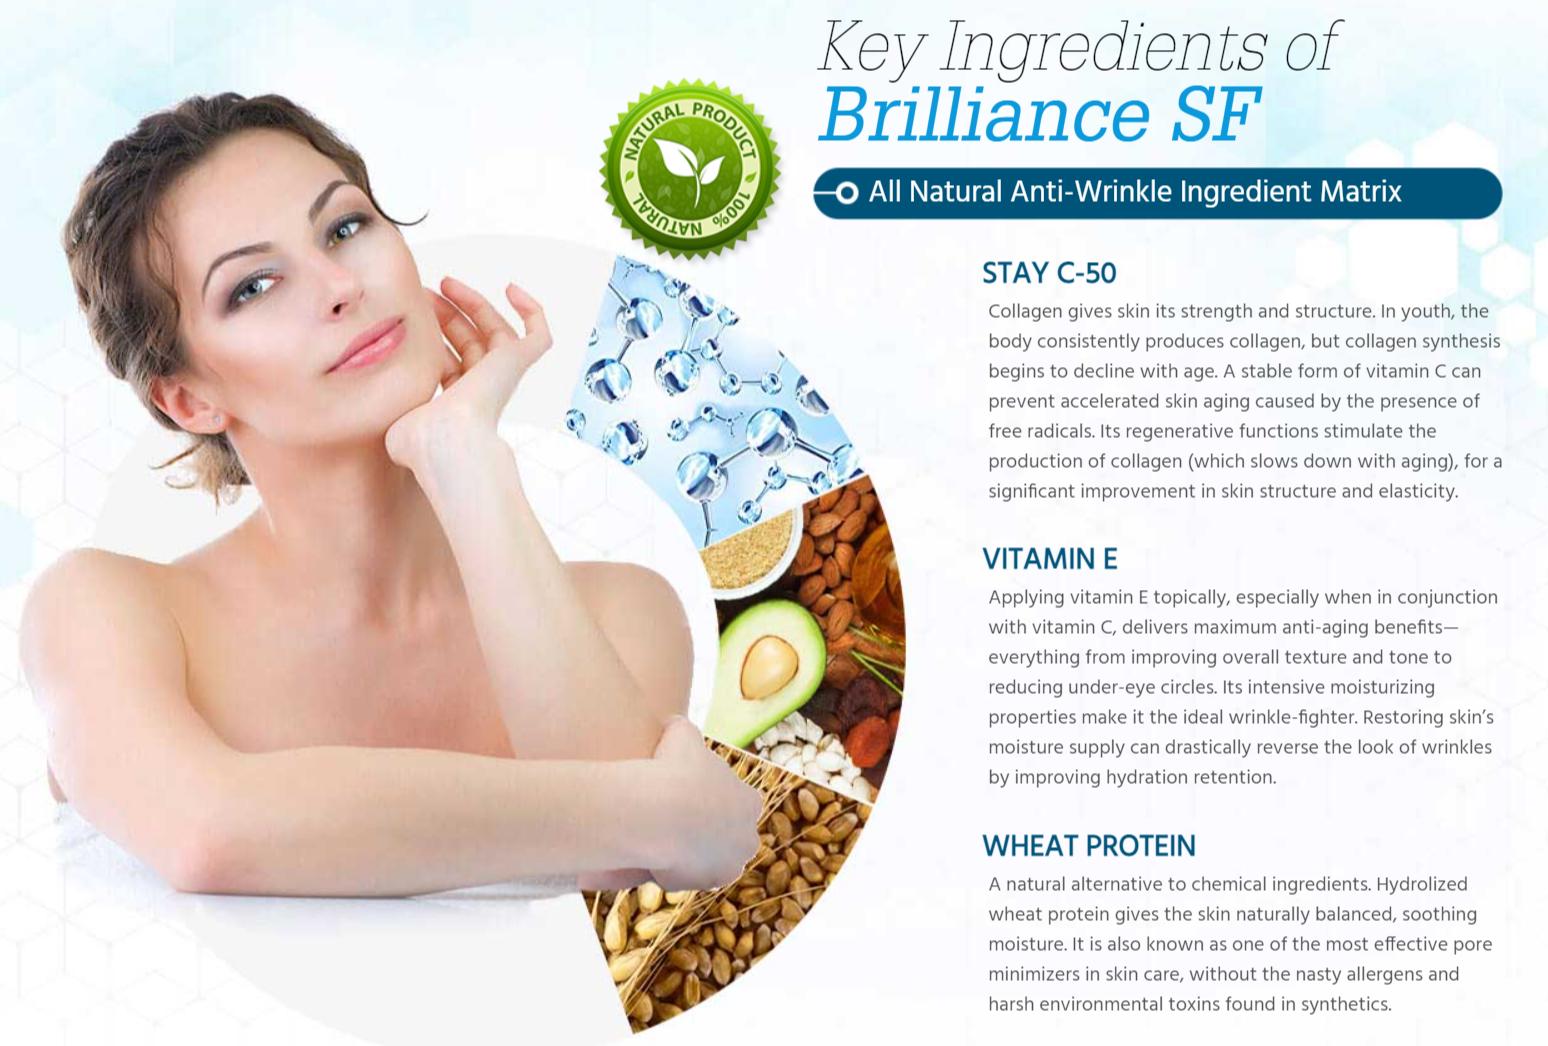 Brilliance SF Ingredients Label